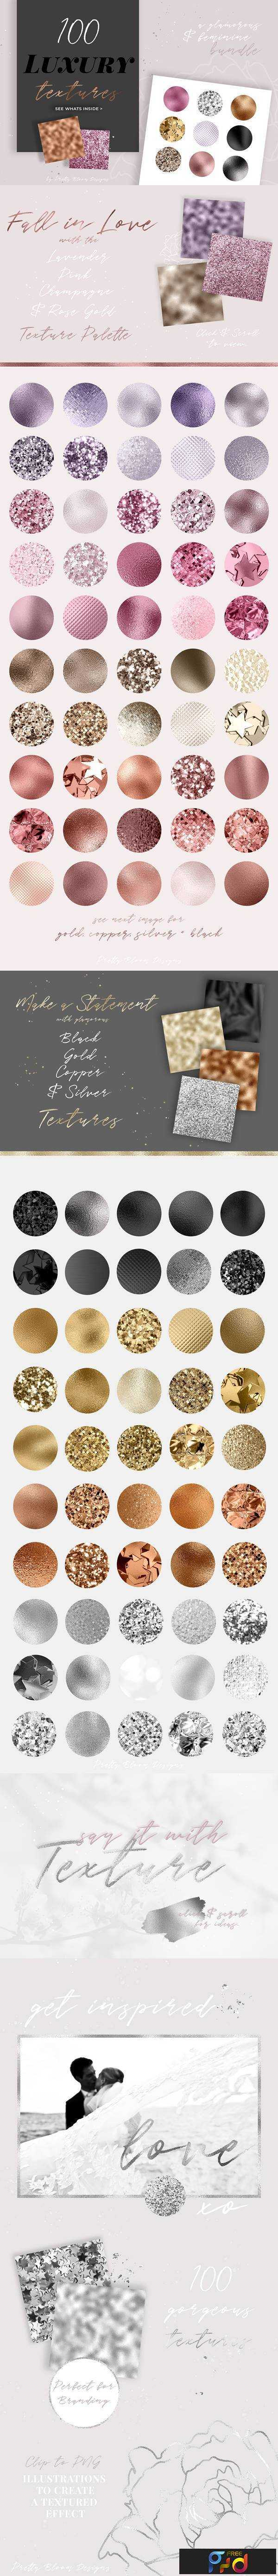 1805224 The Luxury Glam Texture Bundle 2165592 1